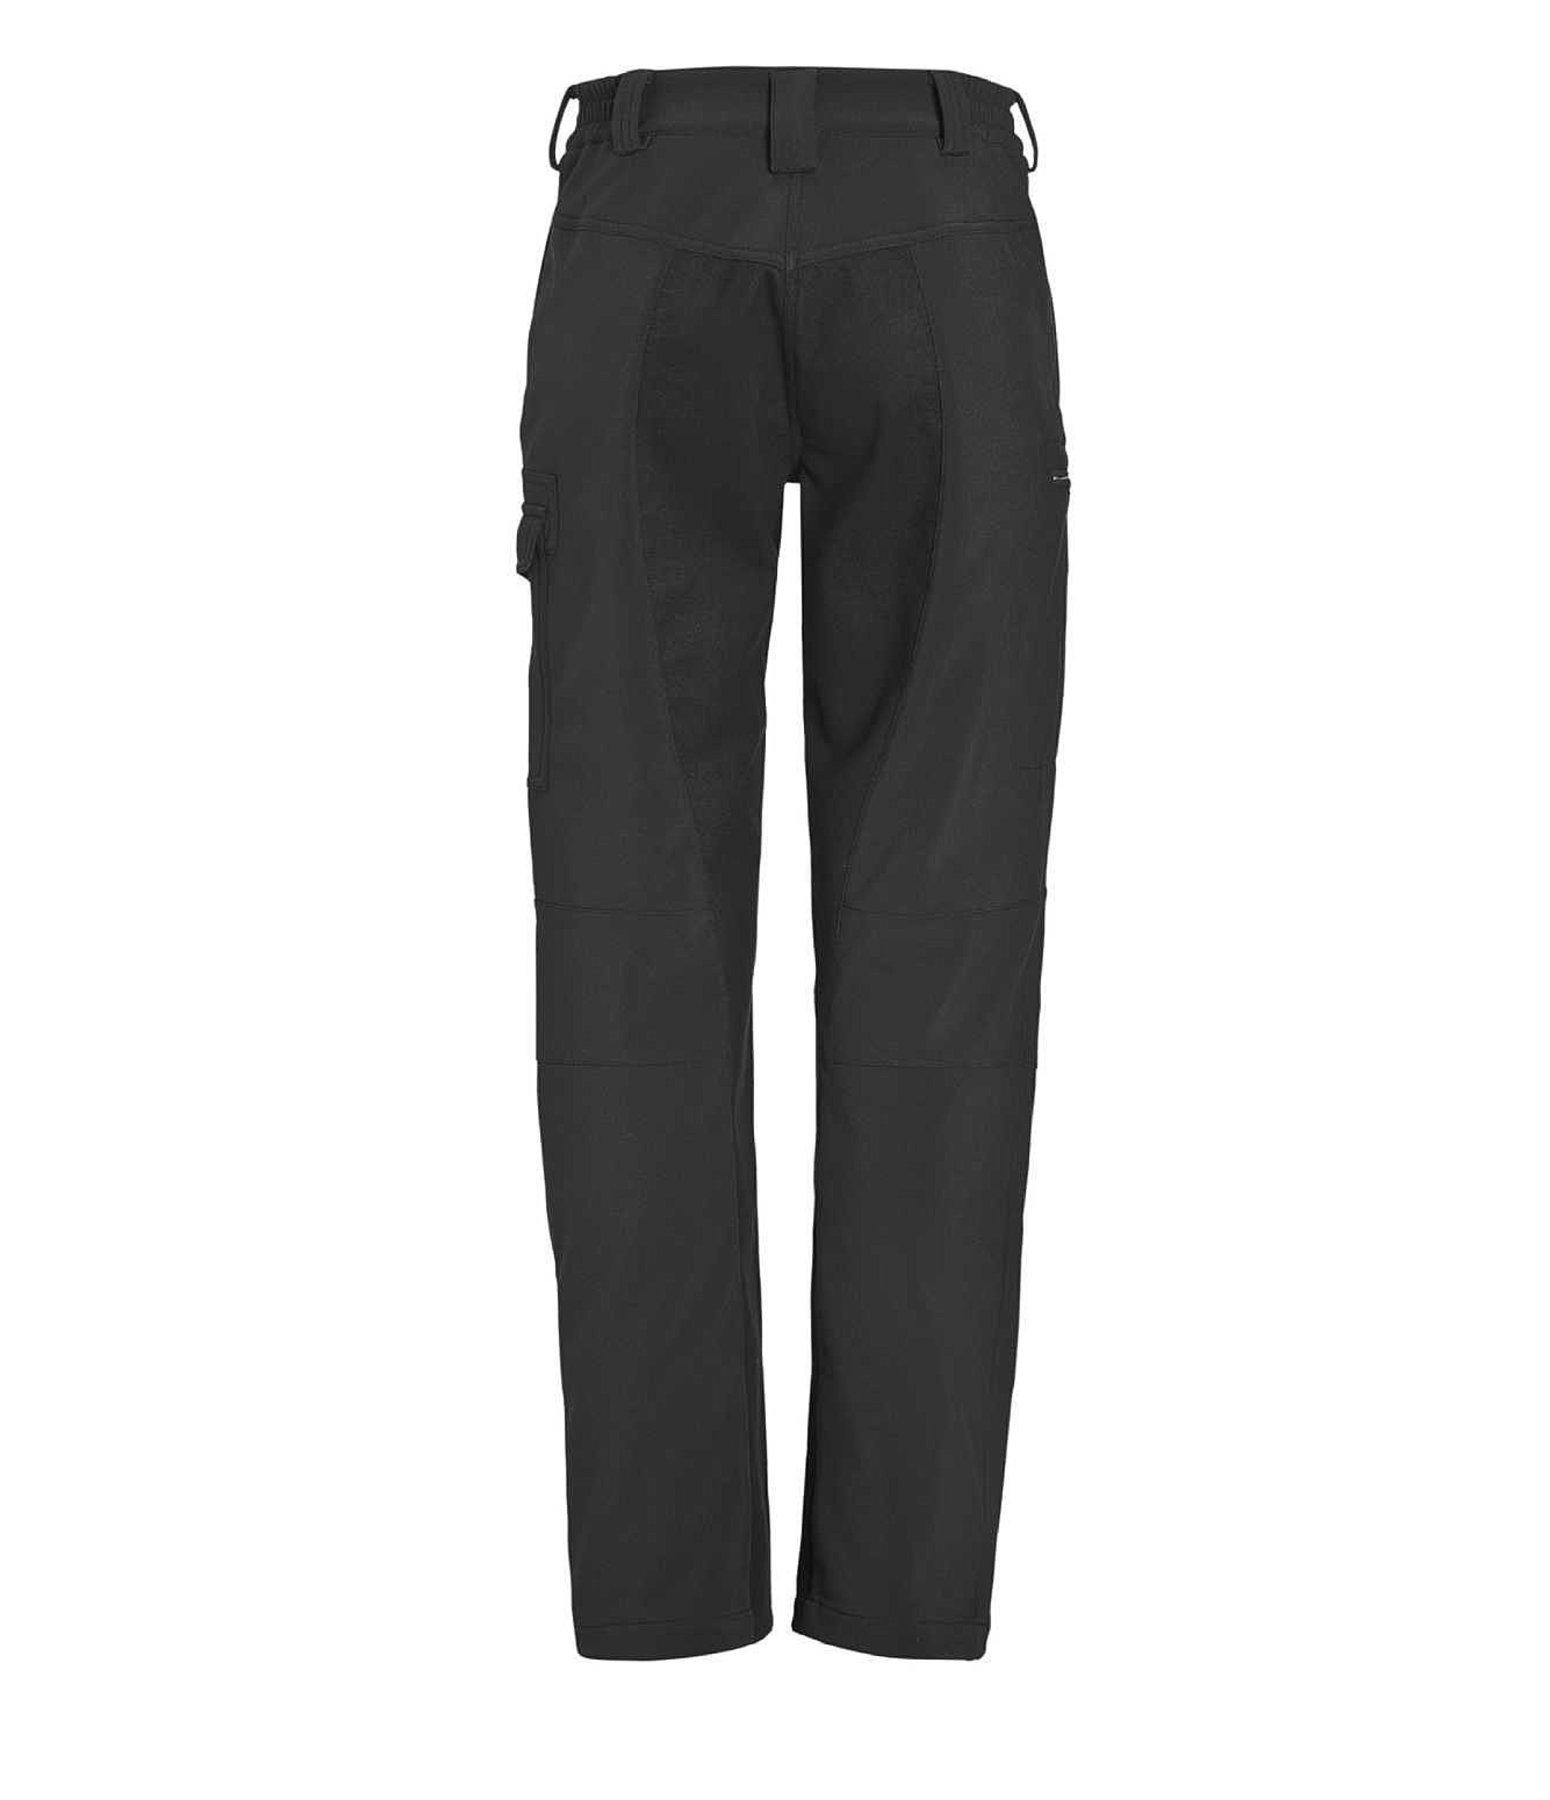 pantalon de randonn e maple version hiver culottes d 39 quitation d 39 hiver kramer equitation. Black Bedroom Furniture Sets. Home Design Ideas